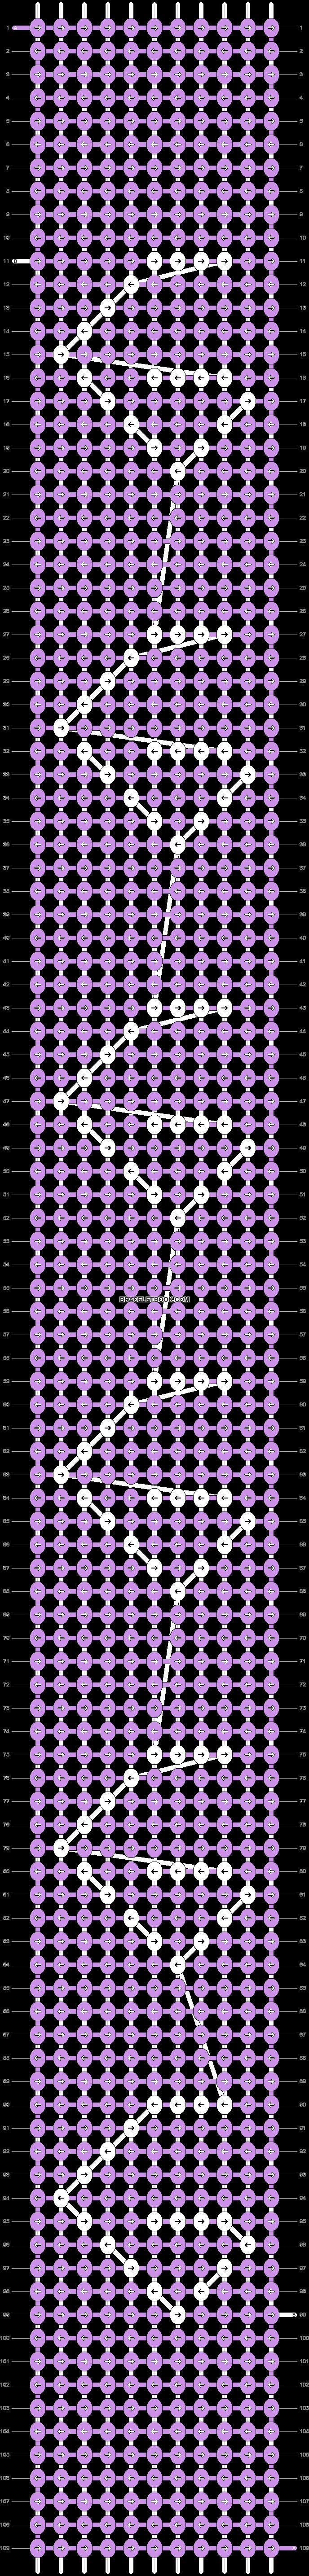 Alpha pattern #93876 pattern